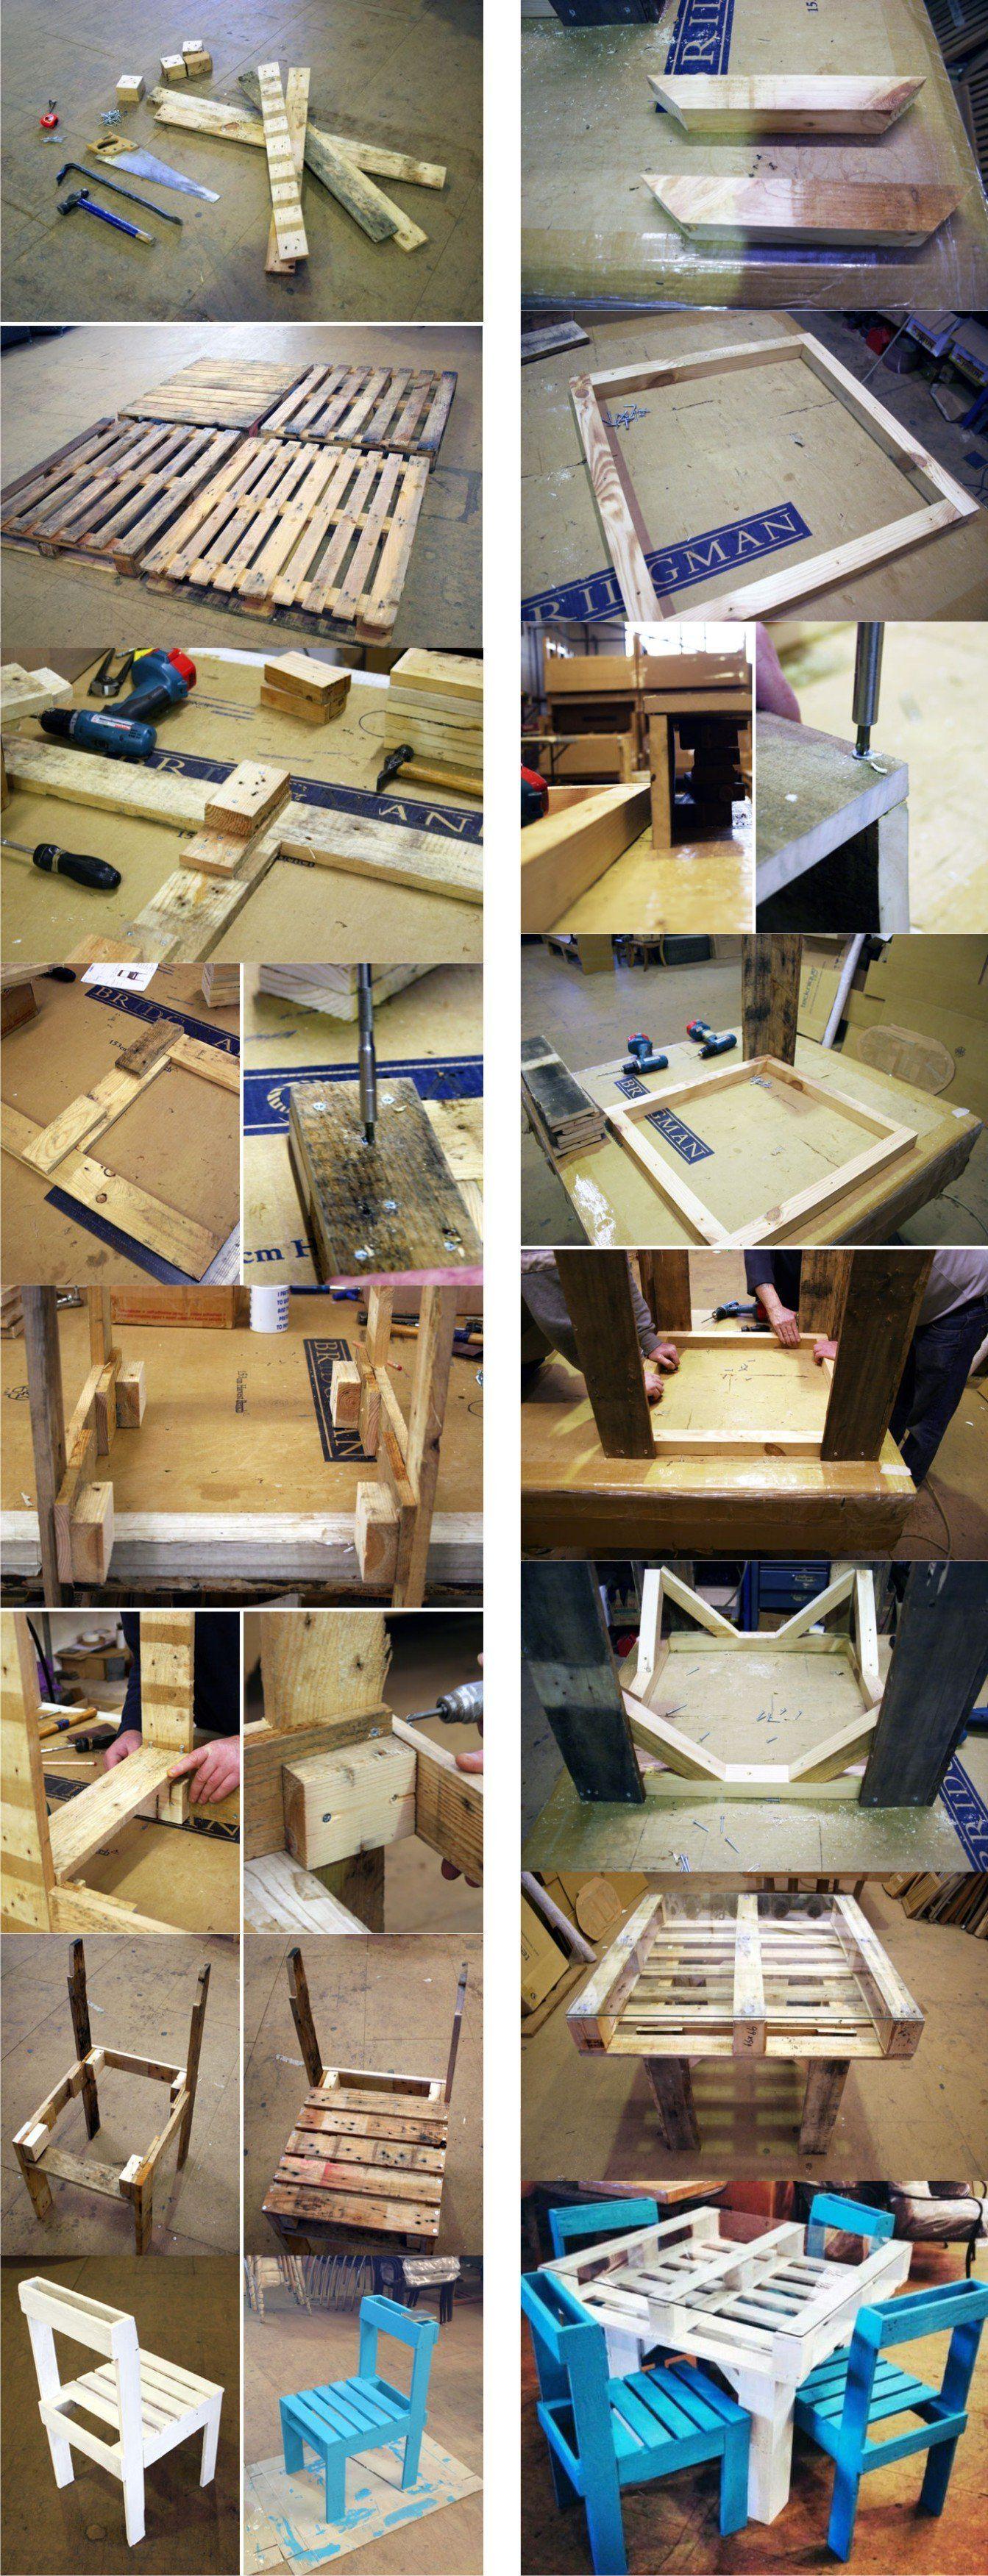 238c0d6b03f808aa9aa08c4f41534744 Impressionnant De Table Transformable Concept